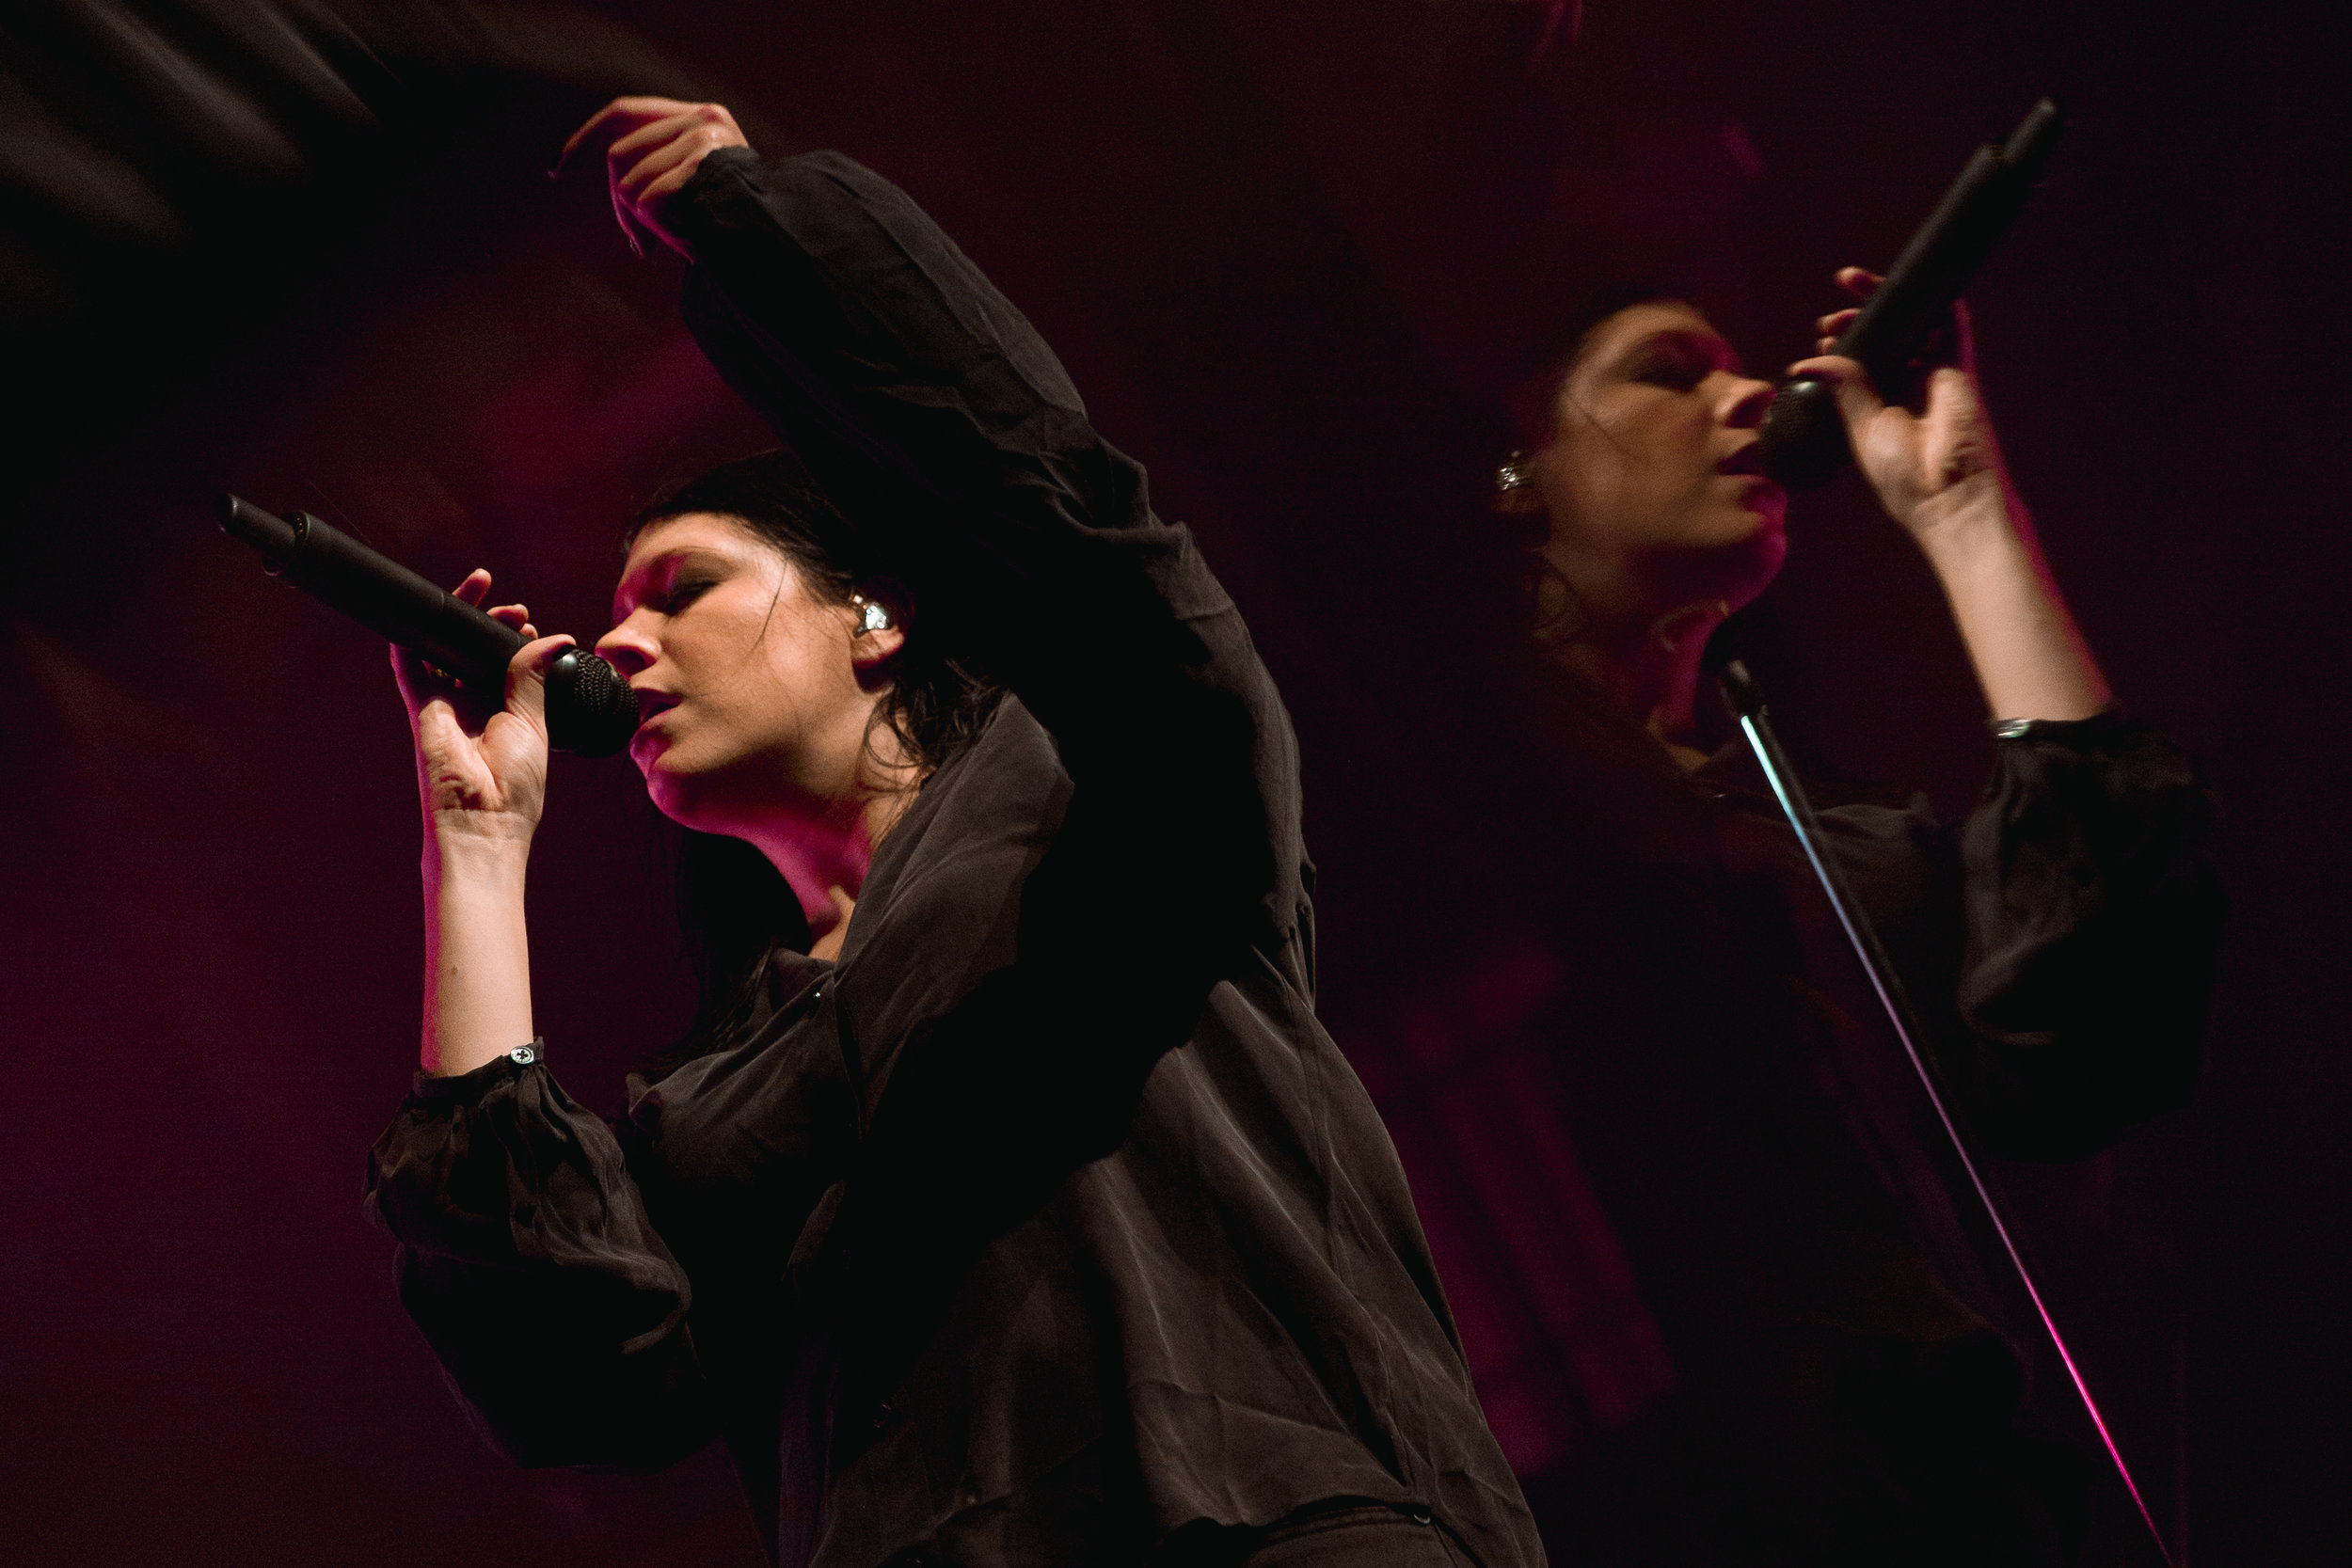 180113-kirby-gladstein-photography-kflay-concert-fonda-la-2018-1034.jpg